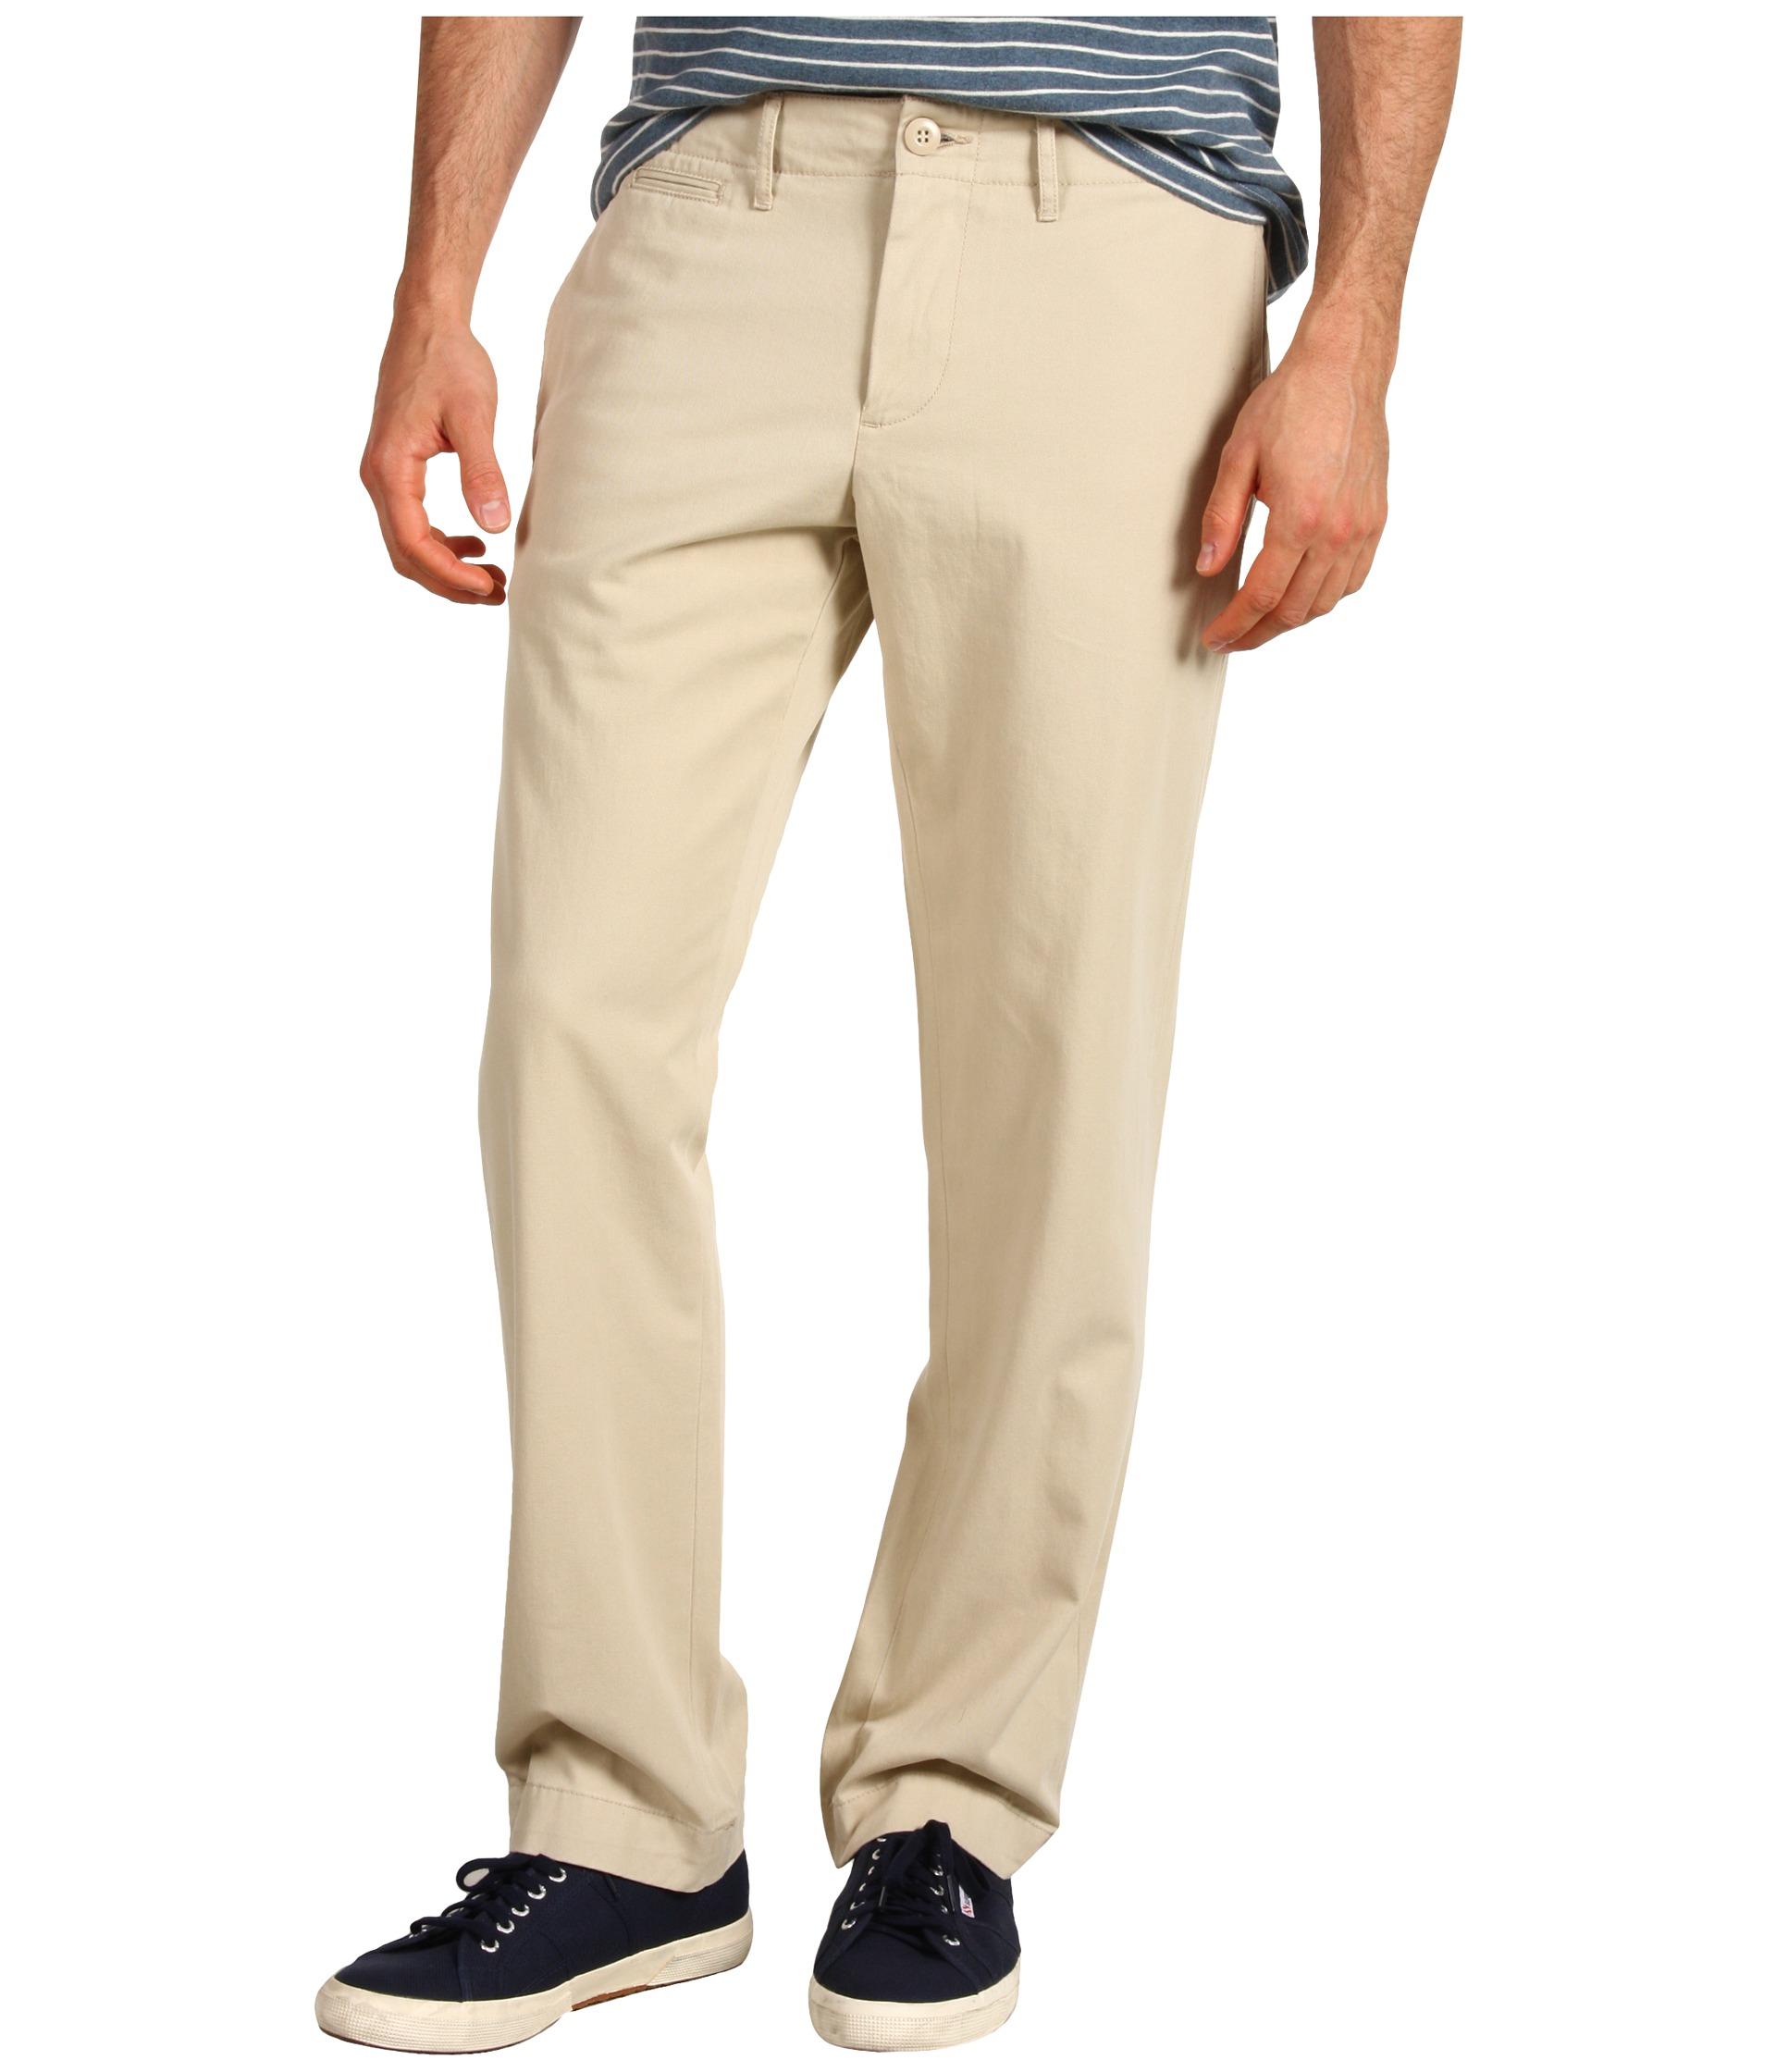 Deals Low Price Lucky Brand Chino Pant Zipper R 1126 Dark Seashell